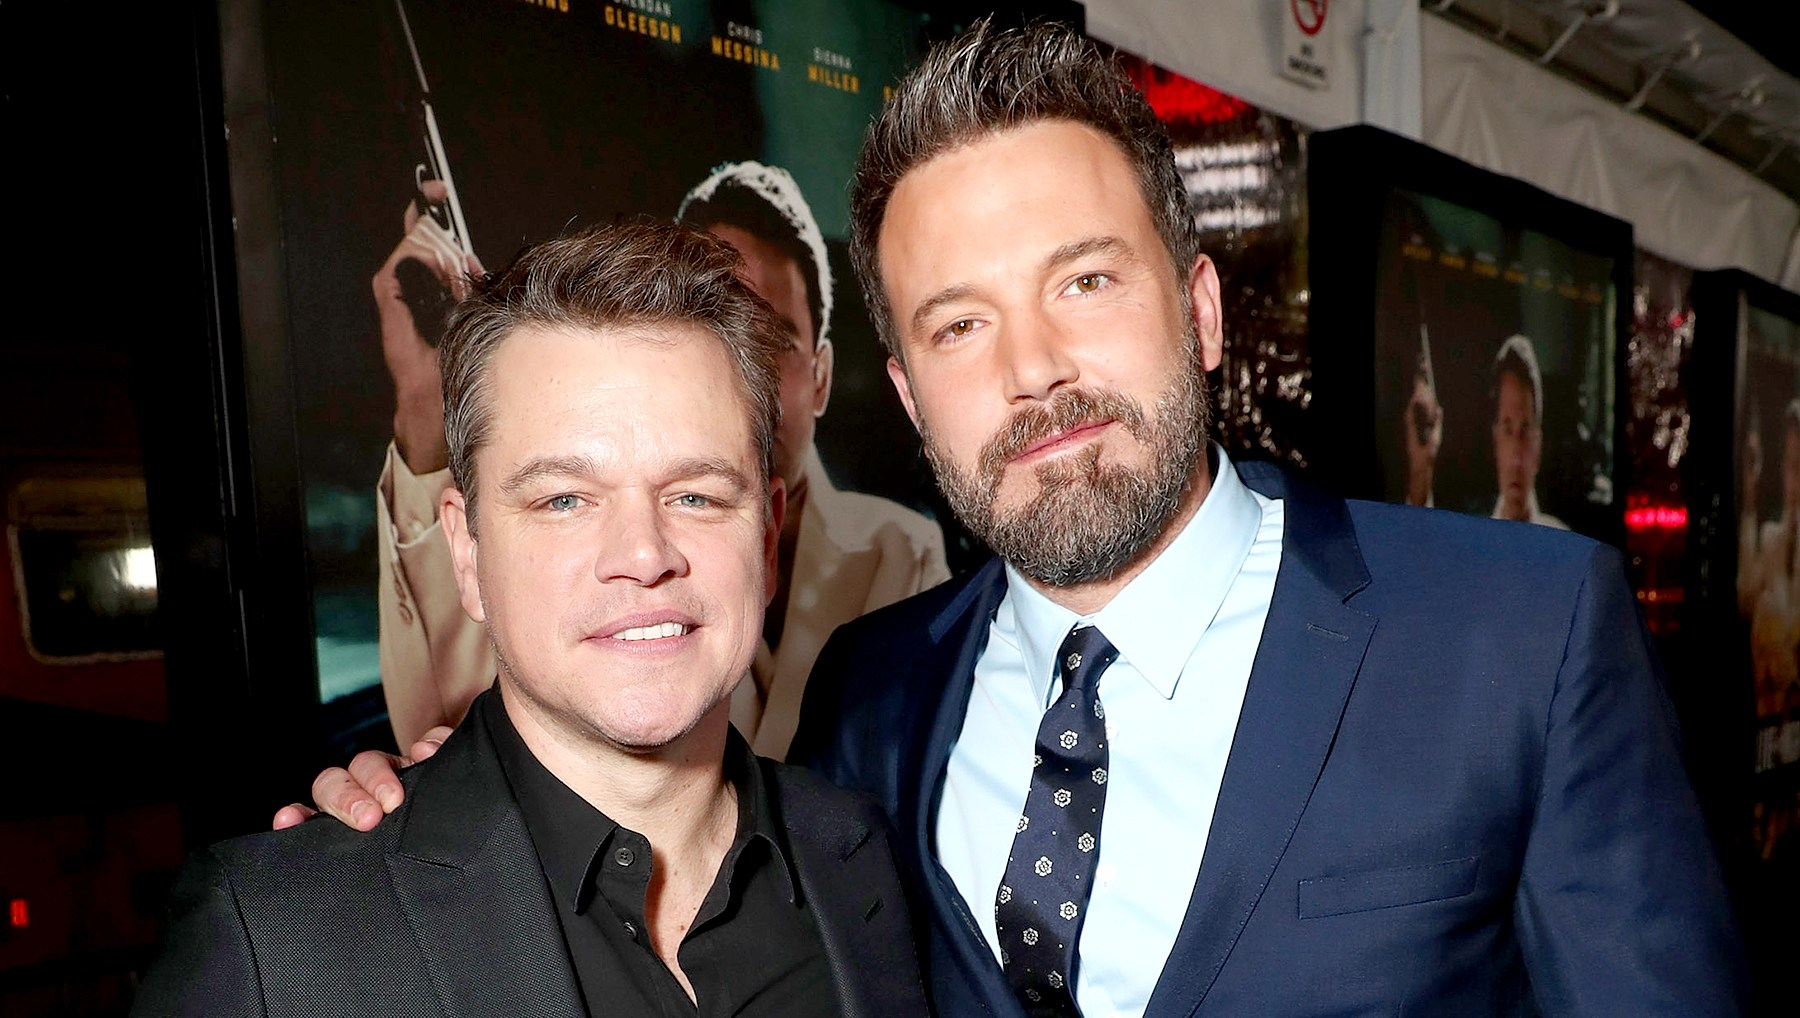 Ben-Affleck-and-Matt-Damon-rider